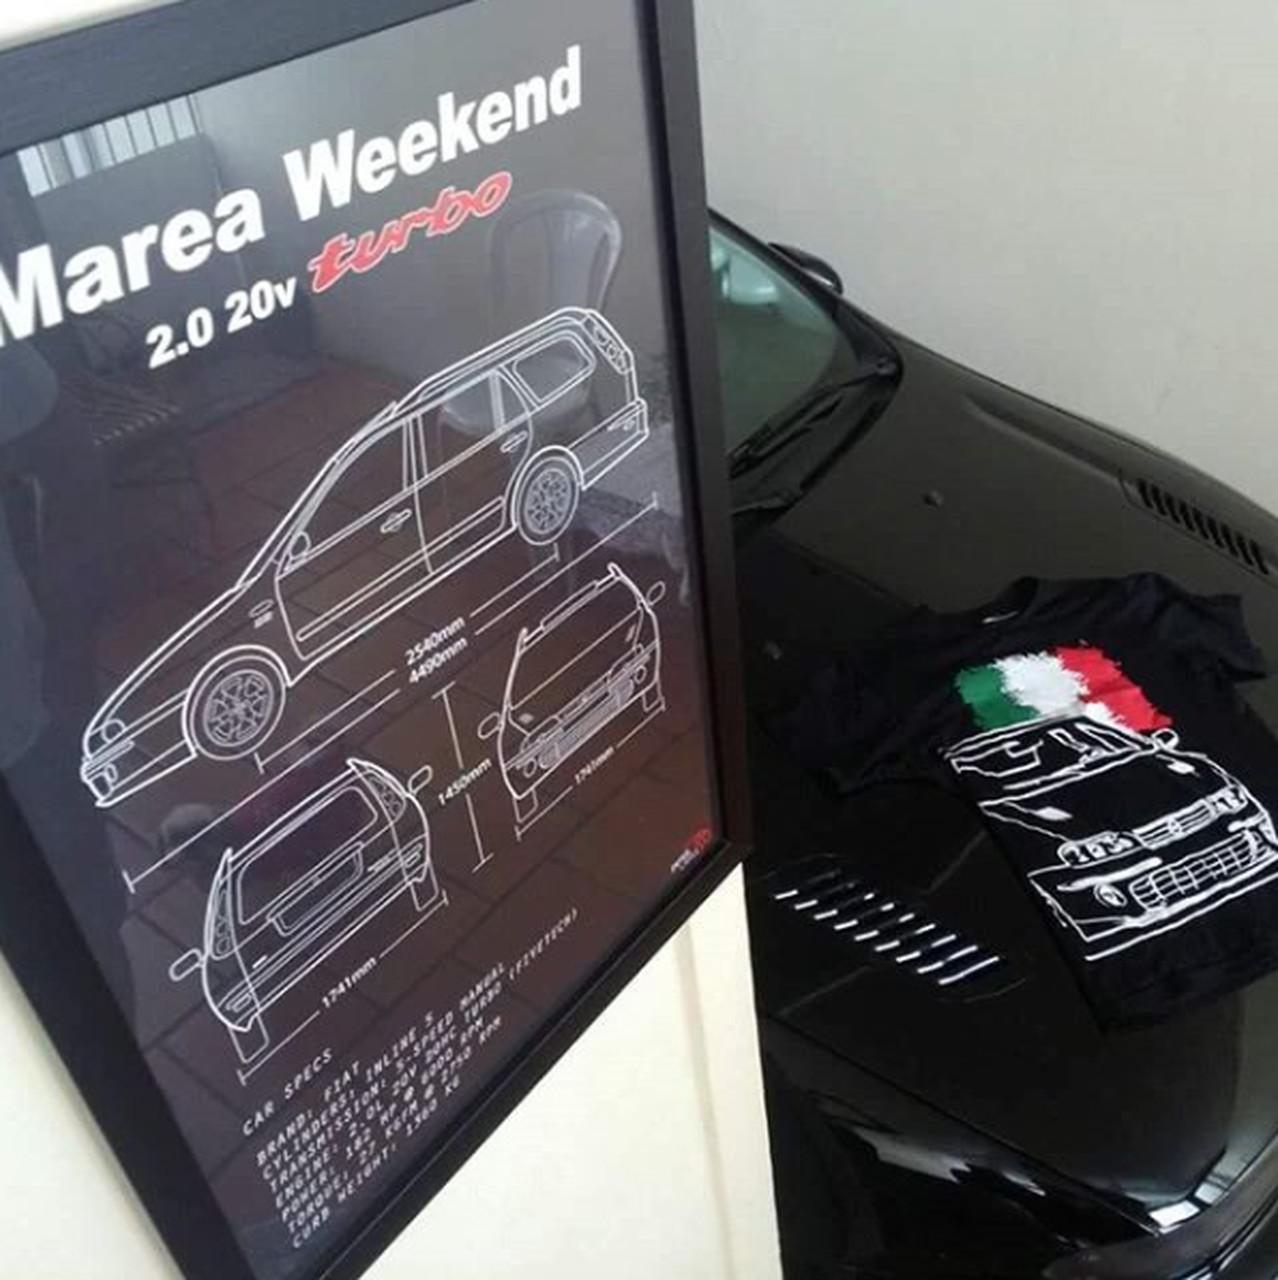 QUADRO/POSTER FIAT MAREA WEEKEND 2.0 TURBO